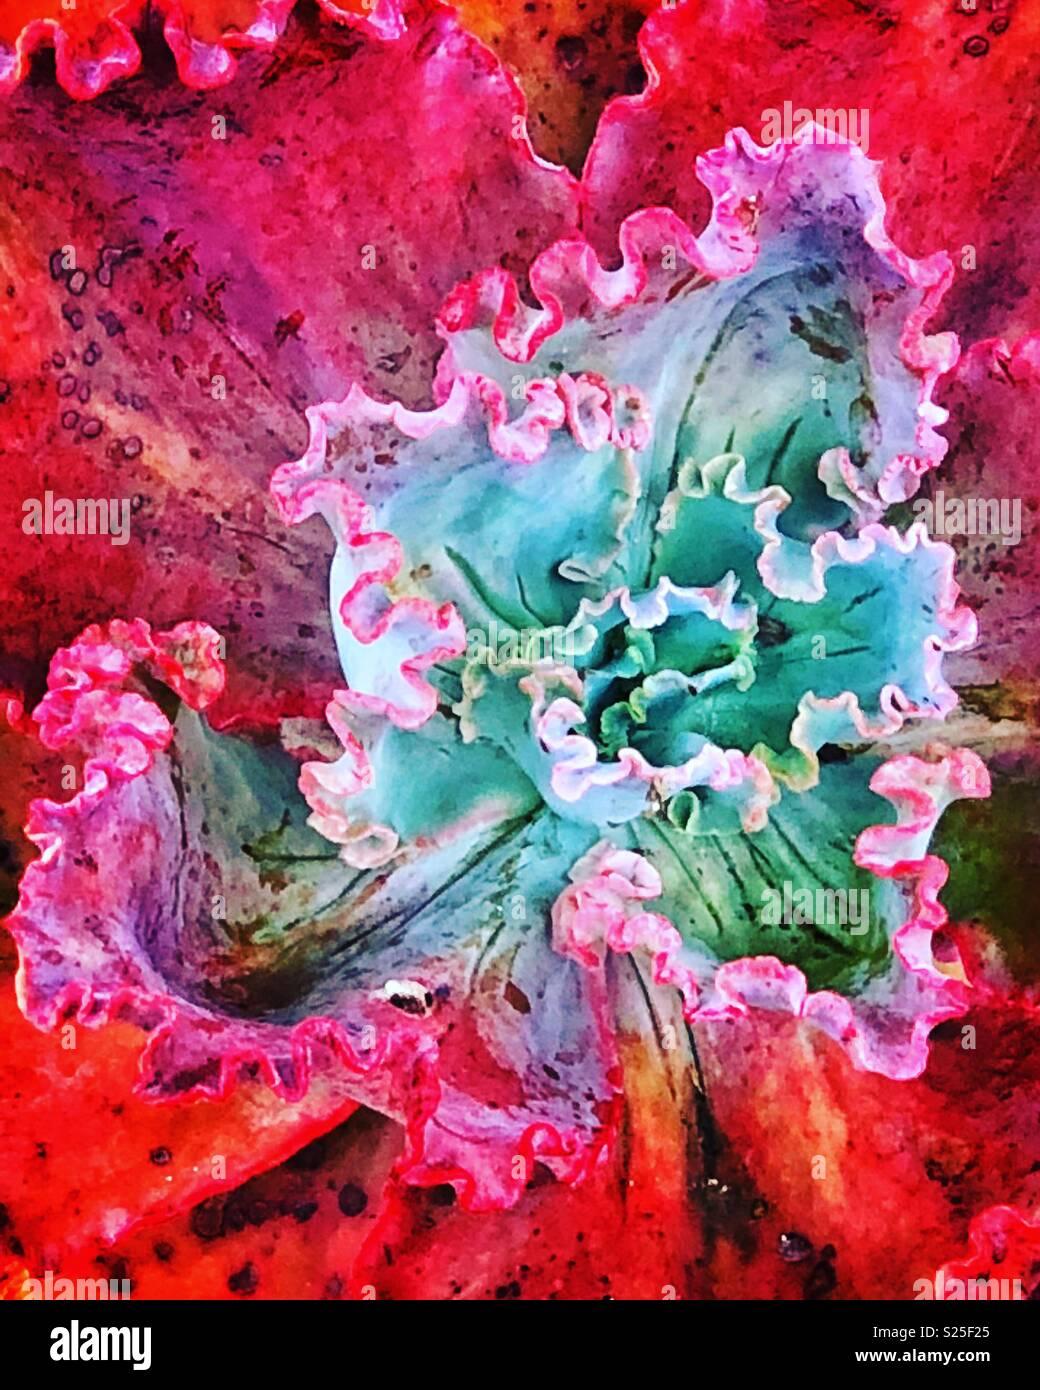 Succulent - Stock Image